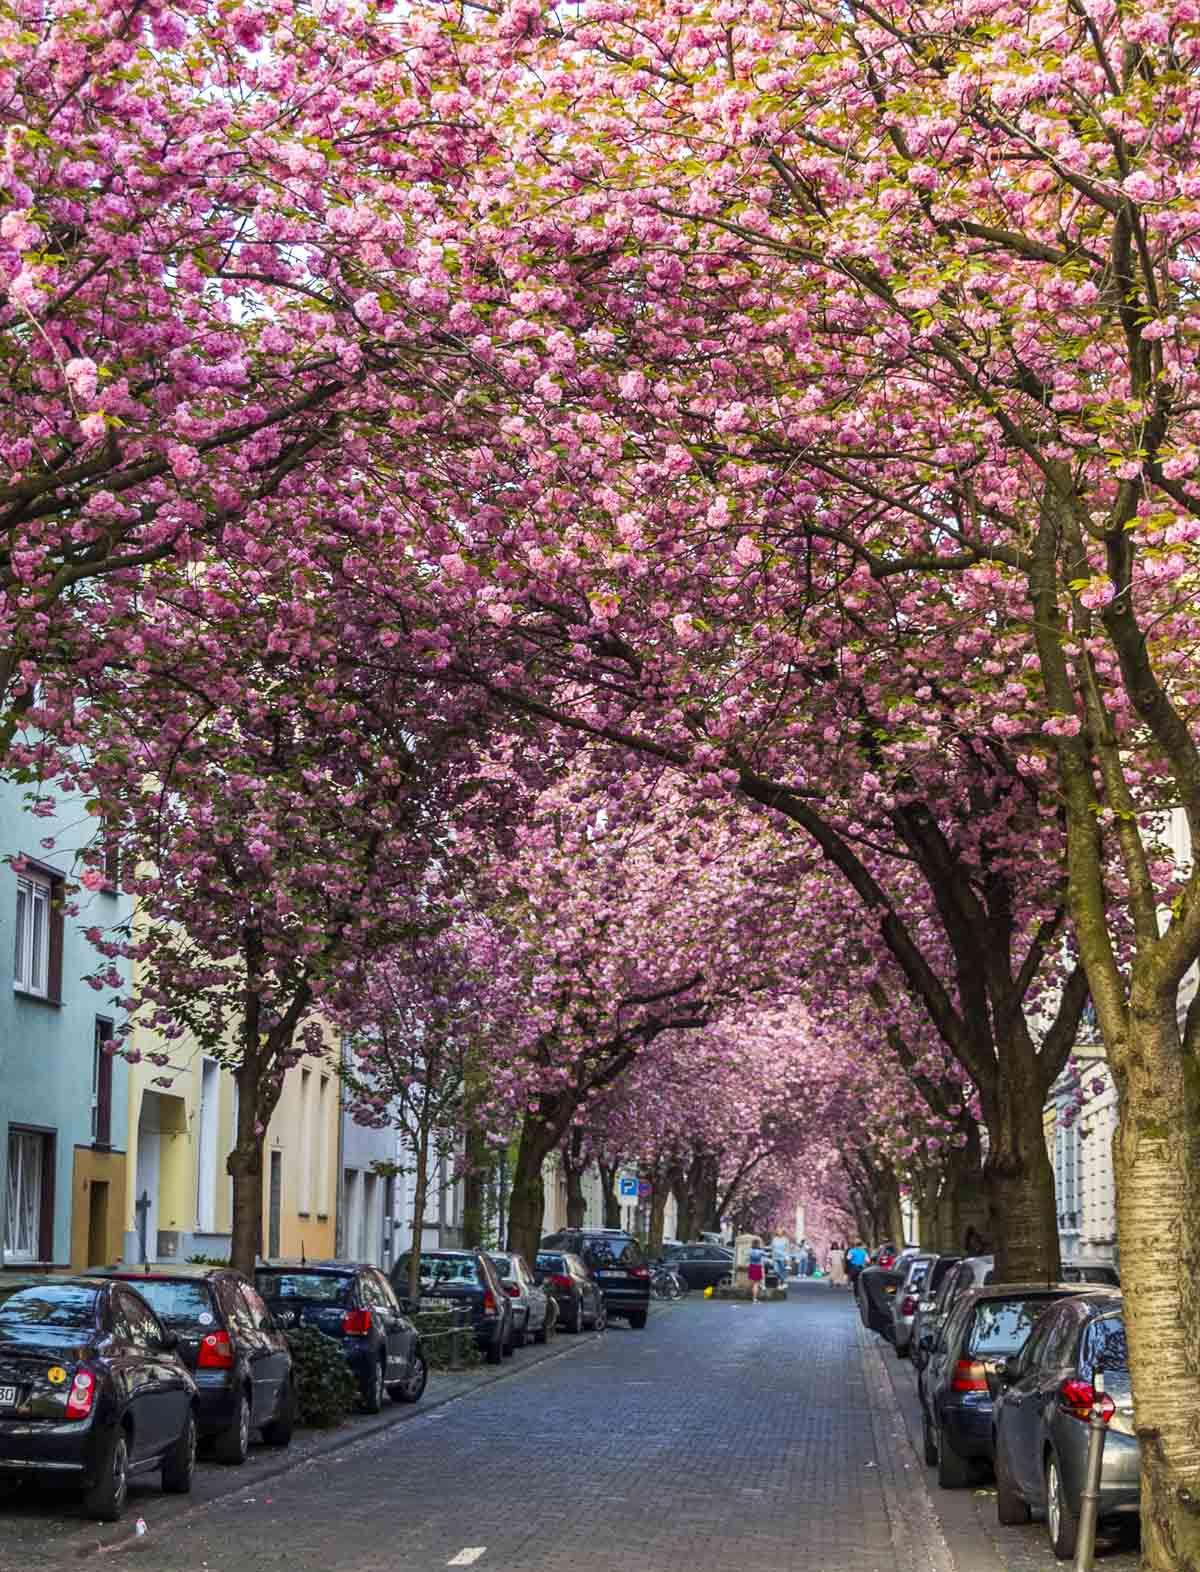 spring destinations in europe bonn germany cherry blossom